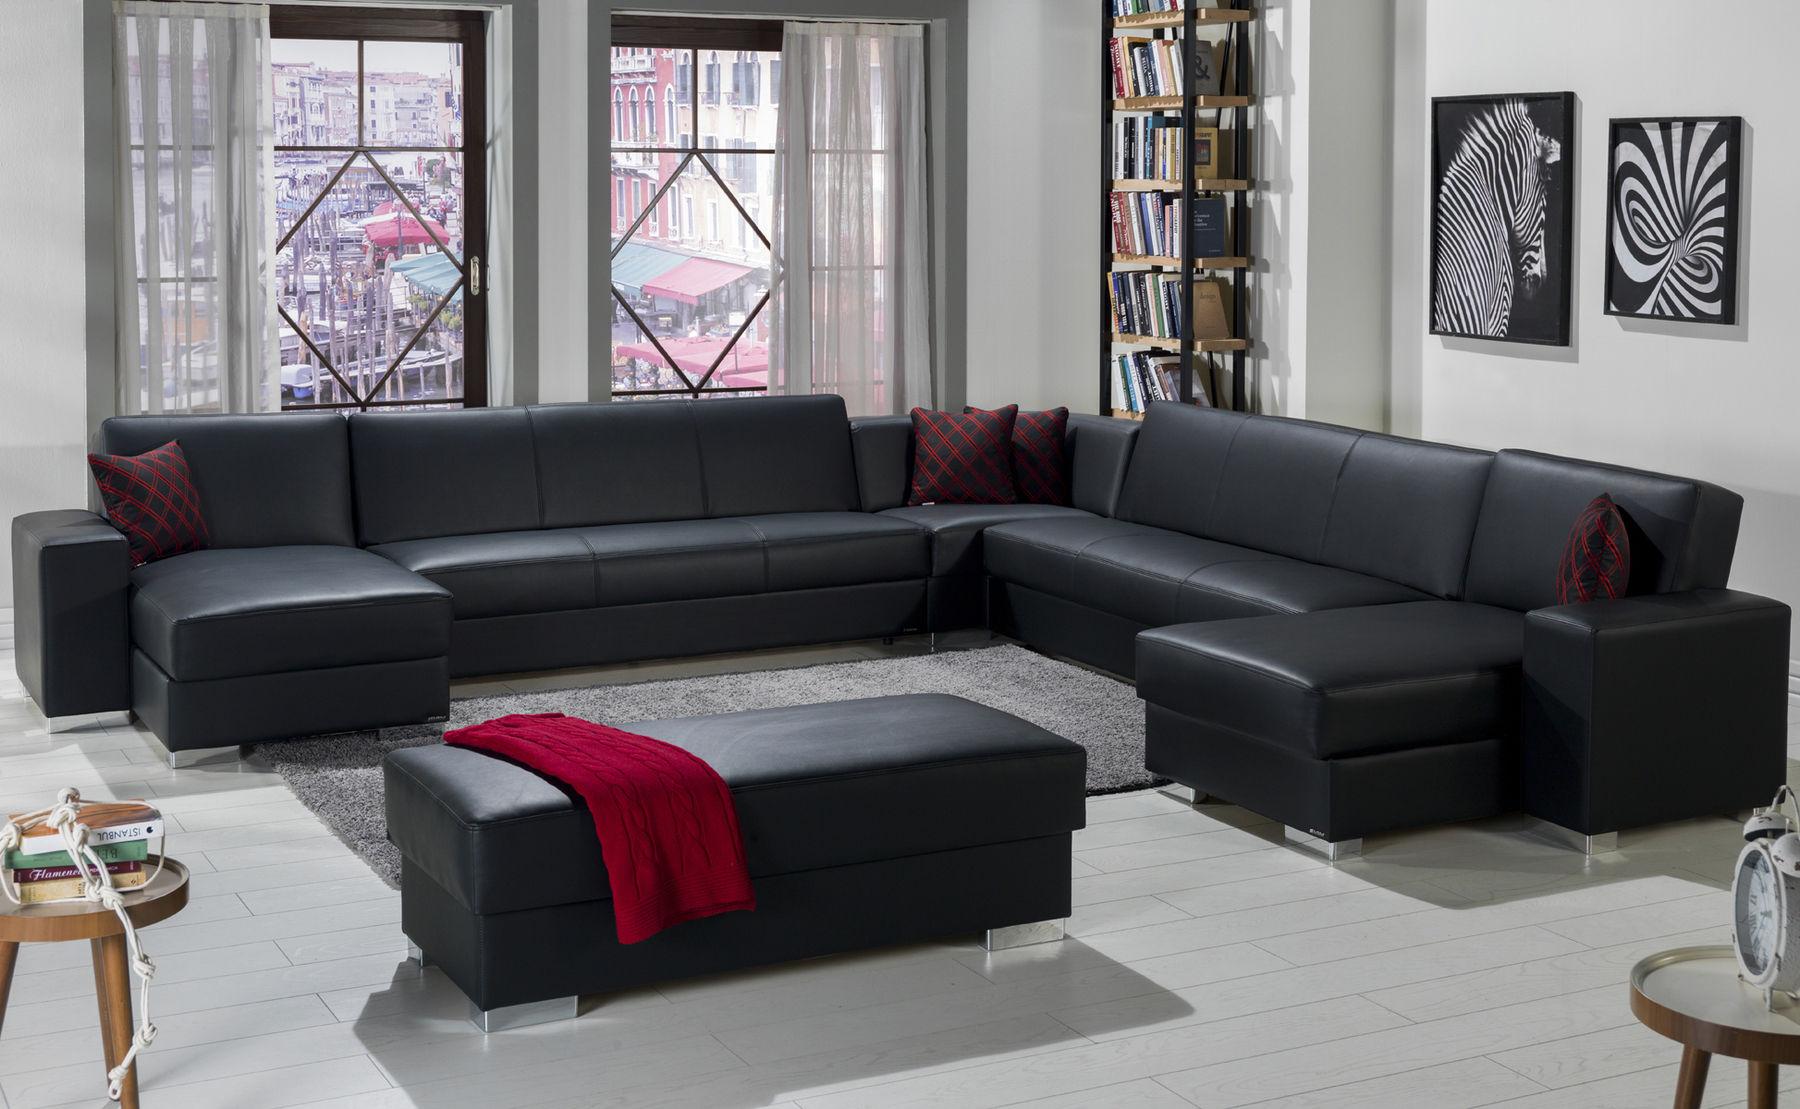 Picture of: Kobe Iii Black Sectional Sofa Kobe 5pcs 2 Istikbal Sectional Sofas Comfyco Furniture